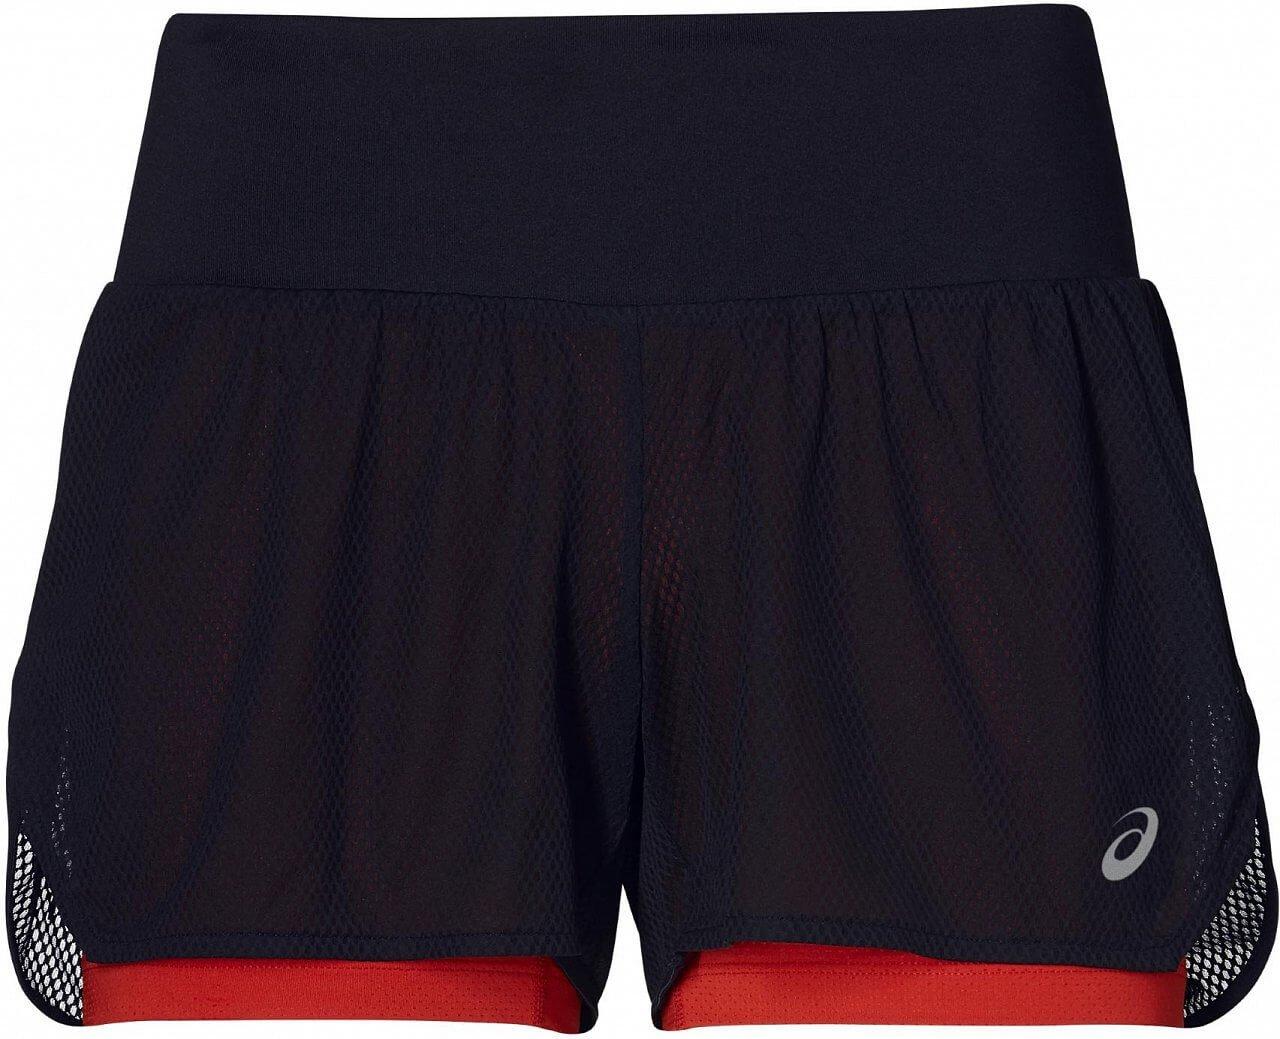 Pantalón corto Asics COOL 2-IN-1 SHORT